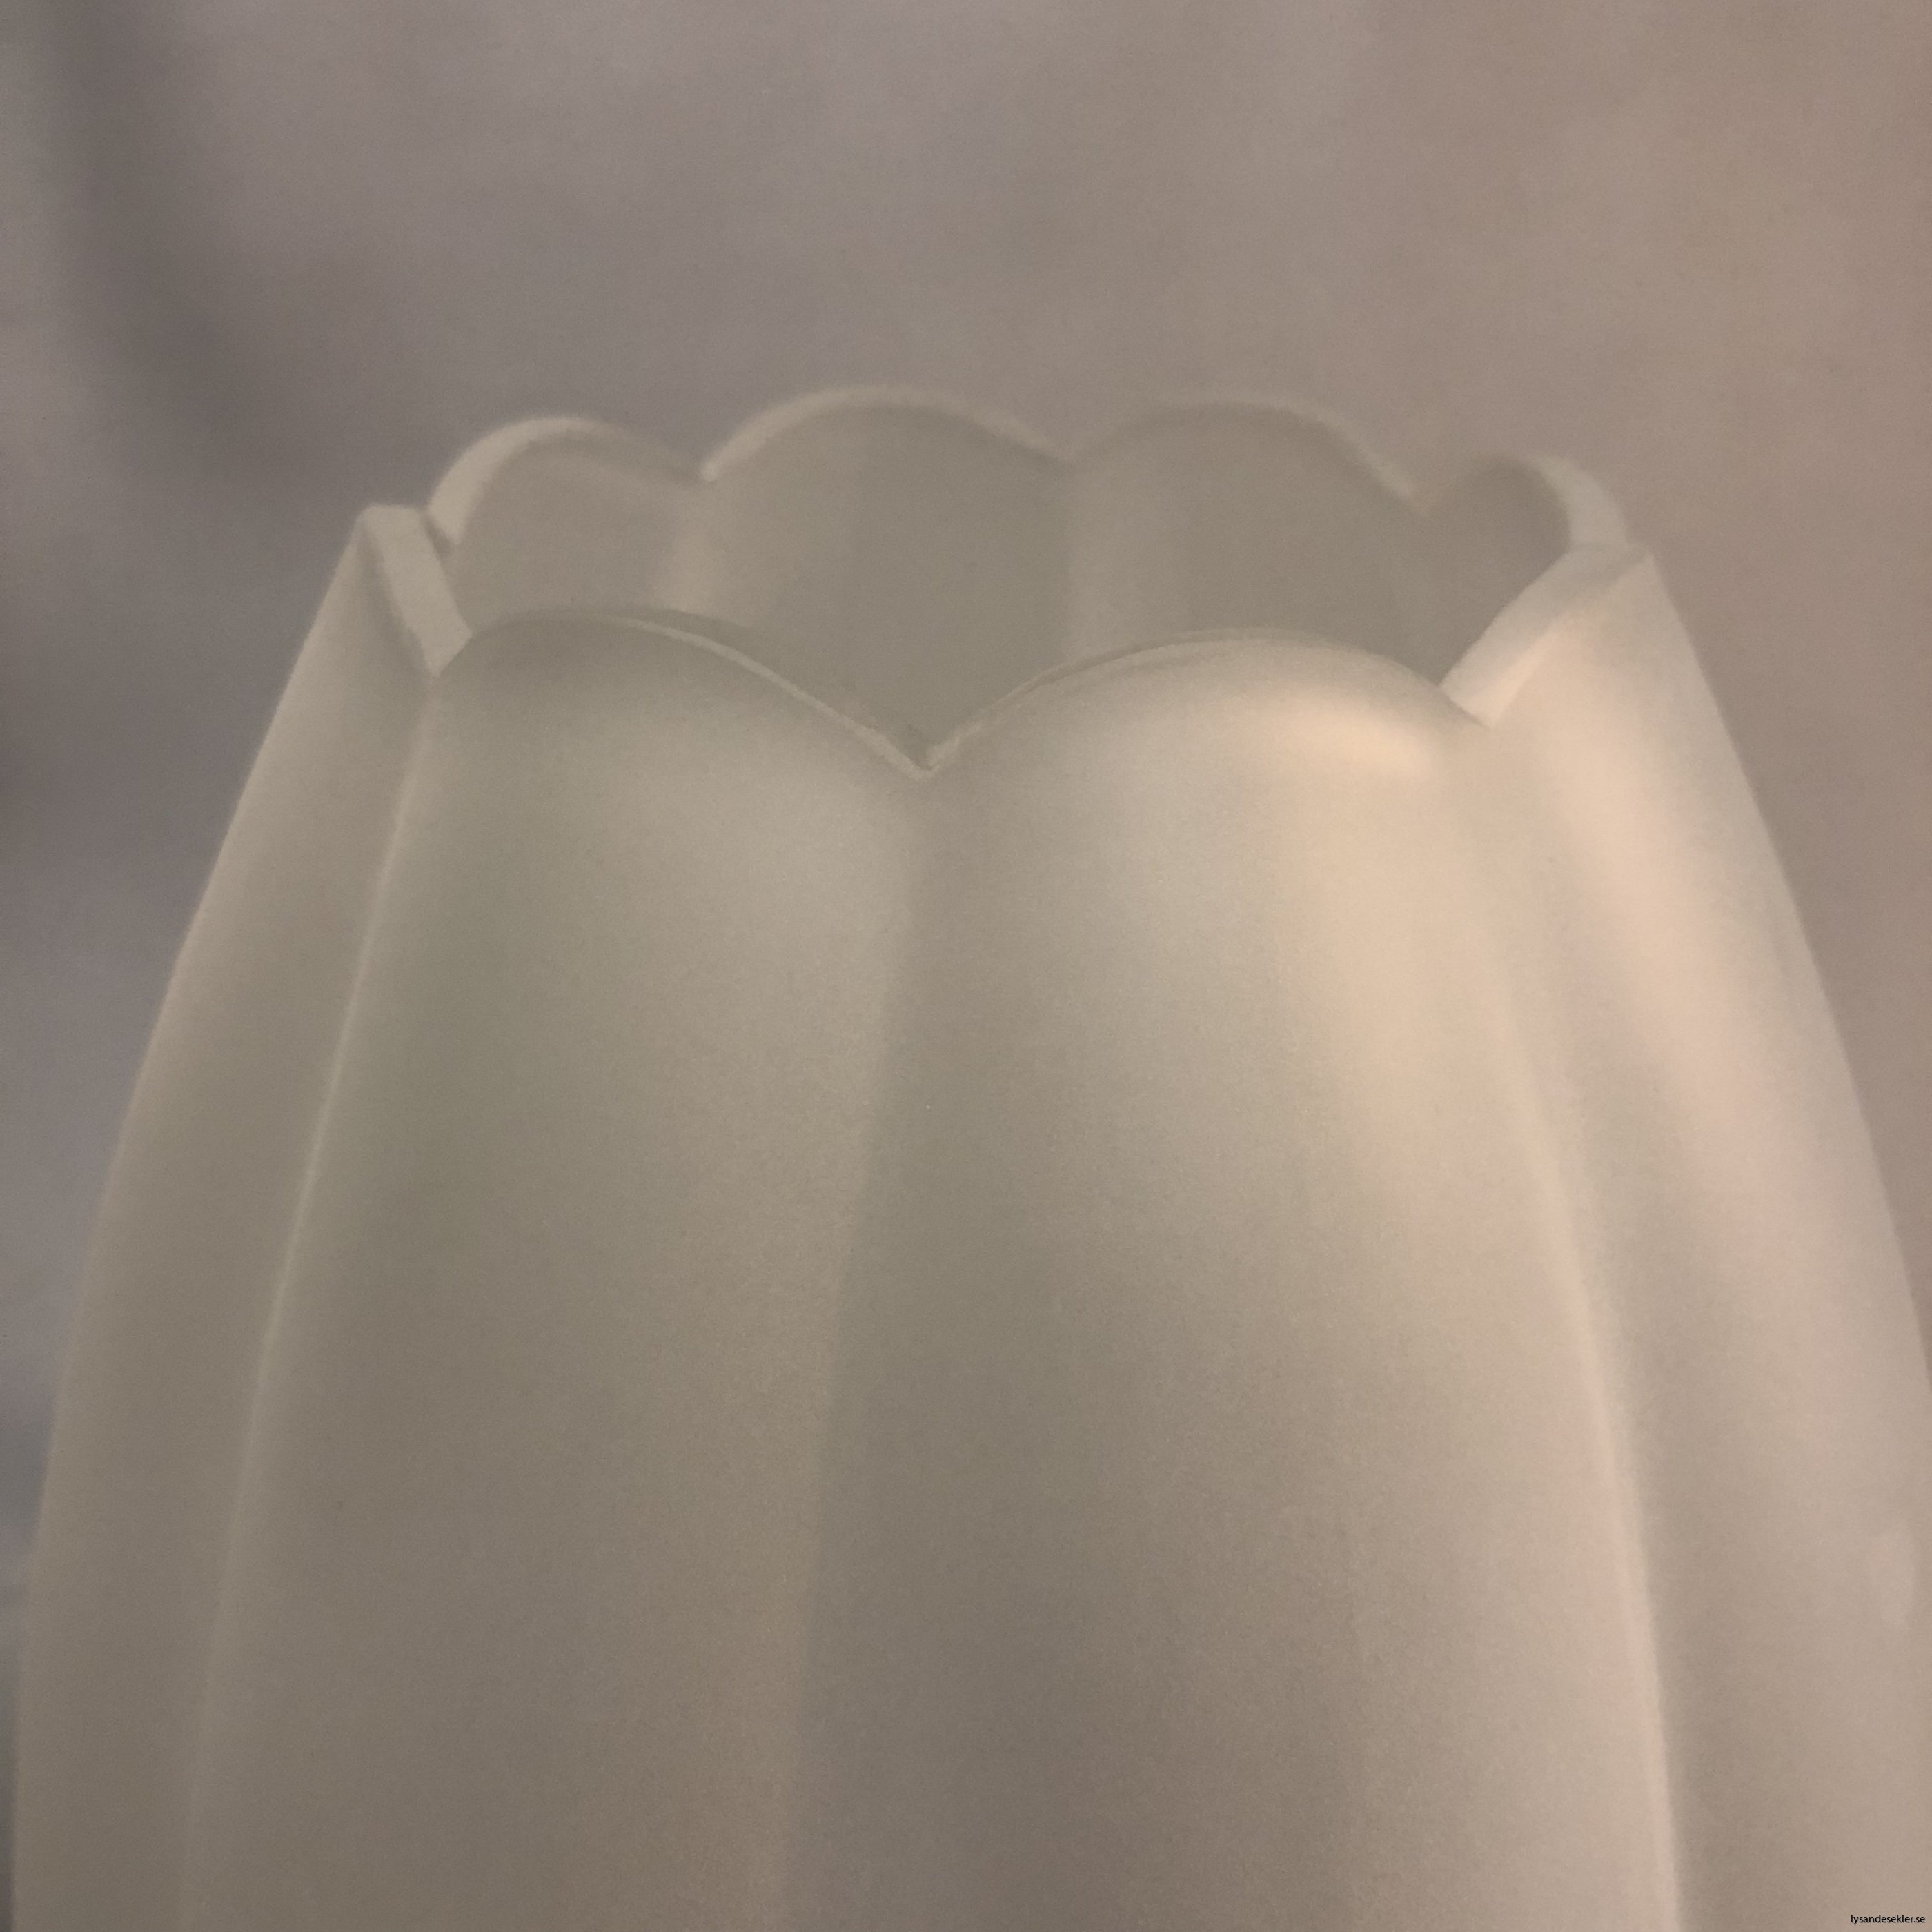 fotogenlampskupa kupa till fotogenlampa tulipan tulpan tulpankupor kupor21